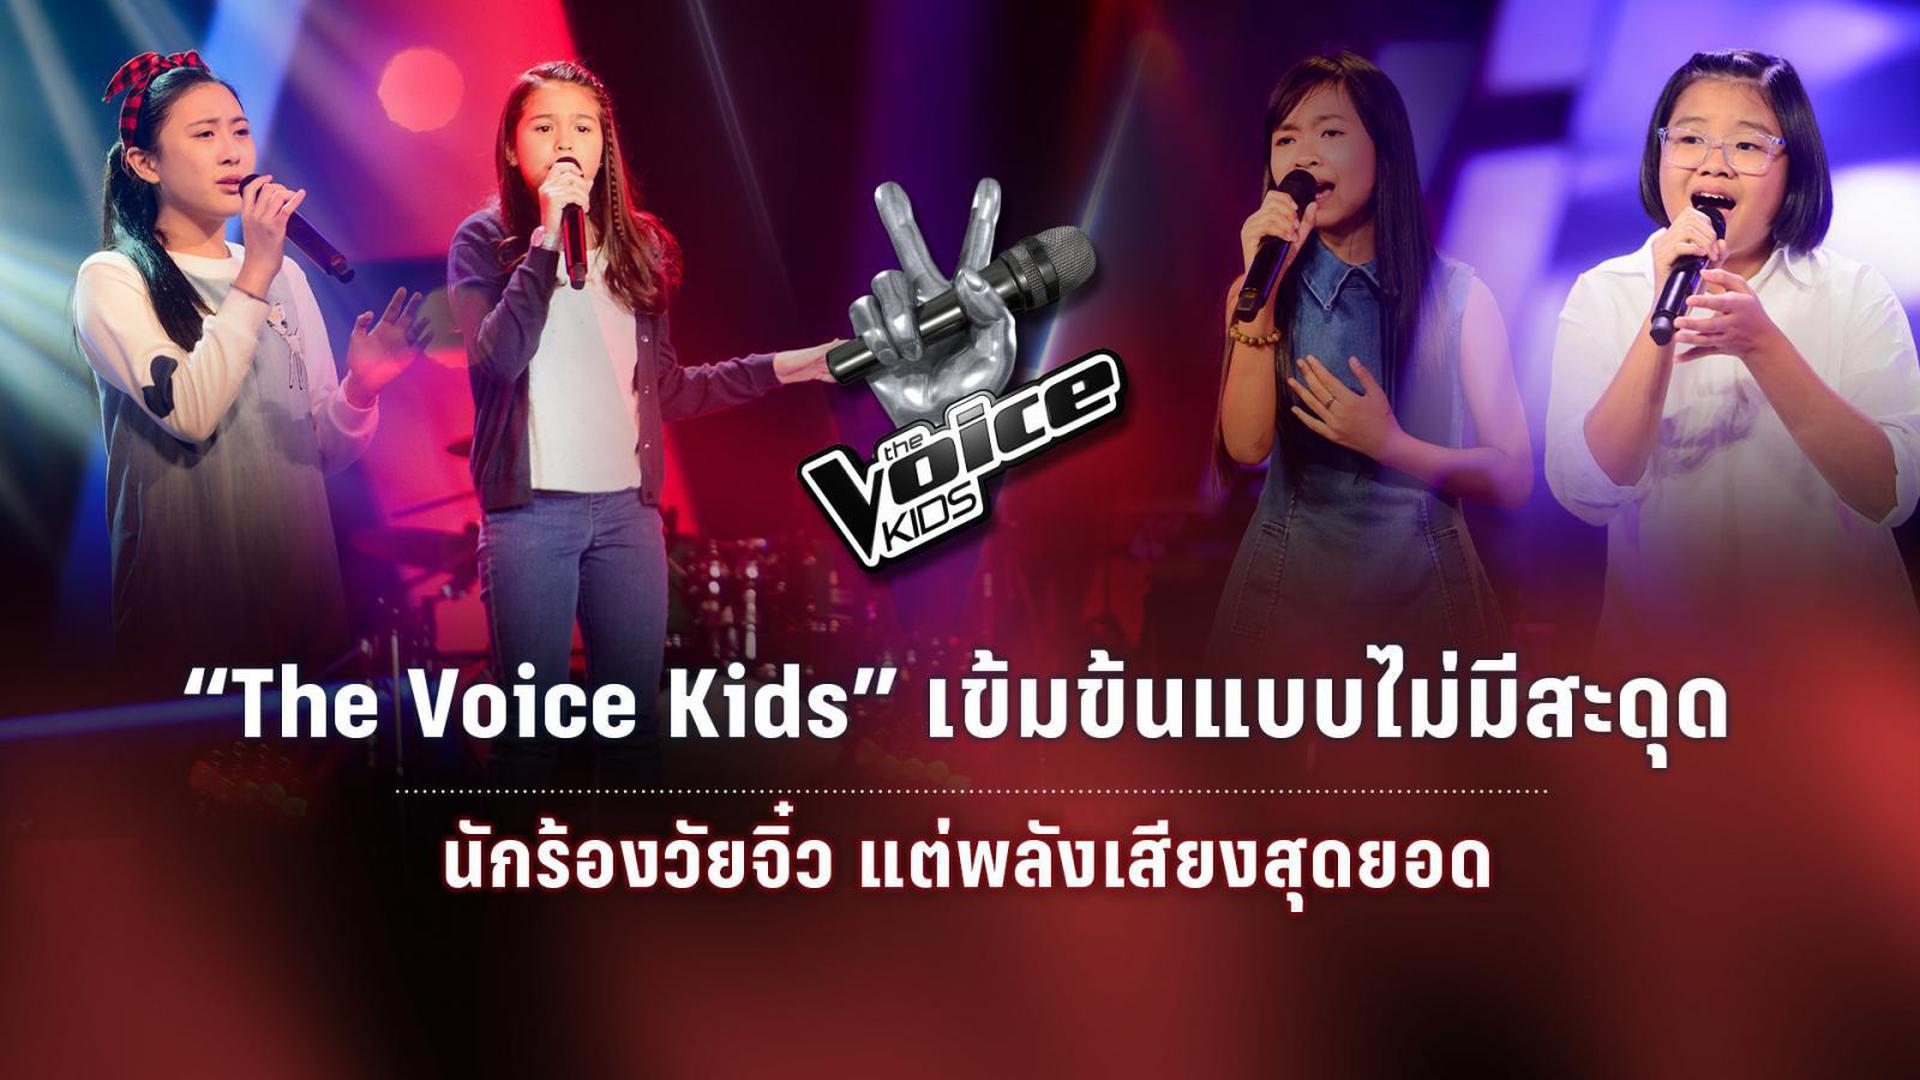 The Voice Kids เข้มข้นแบบไม่มีสะดุด นักร้องวัยจิ๋วแต่พลังเสียงสุดยอด